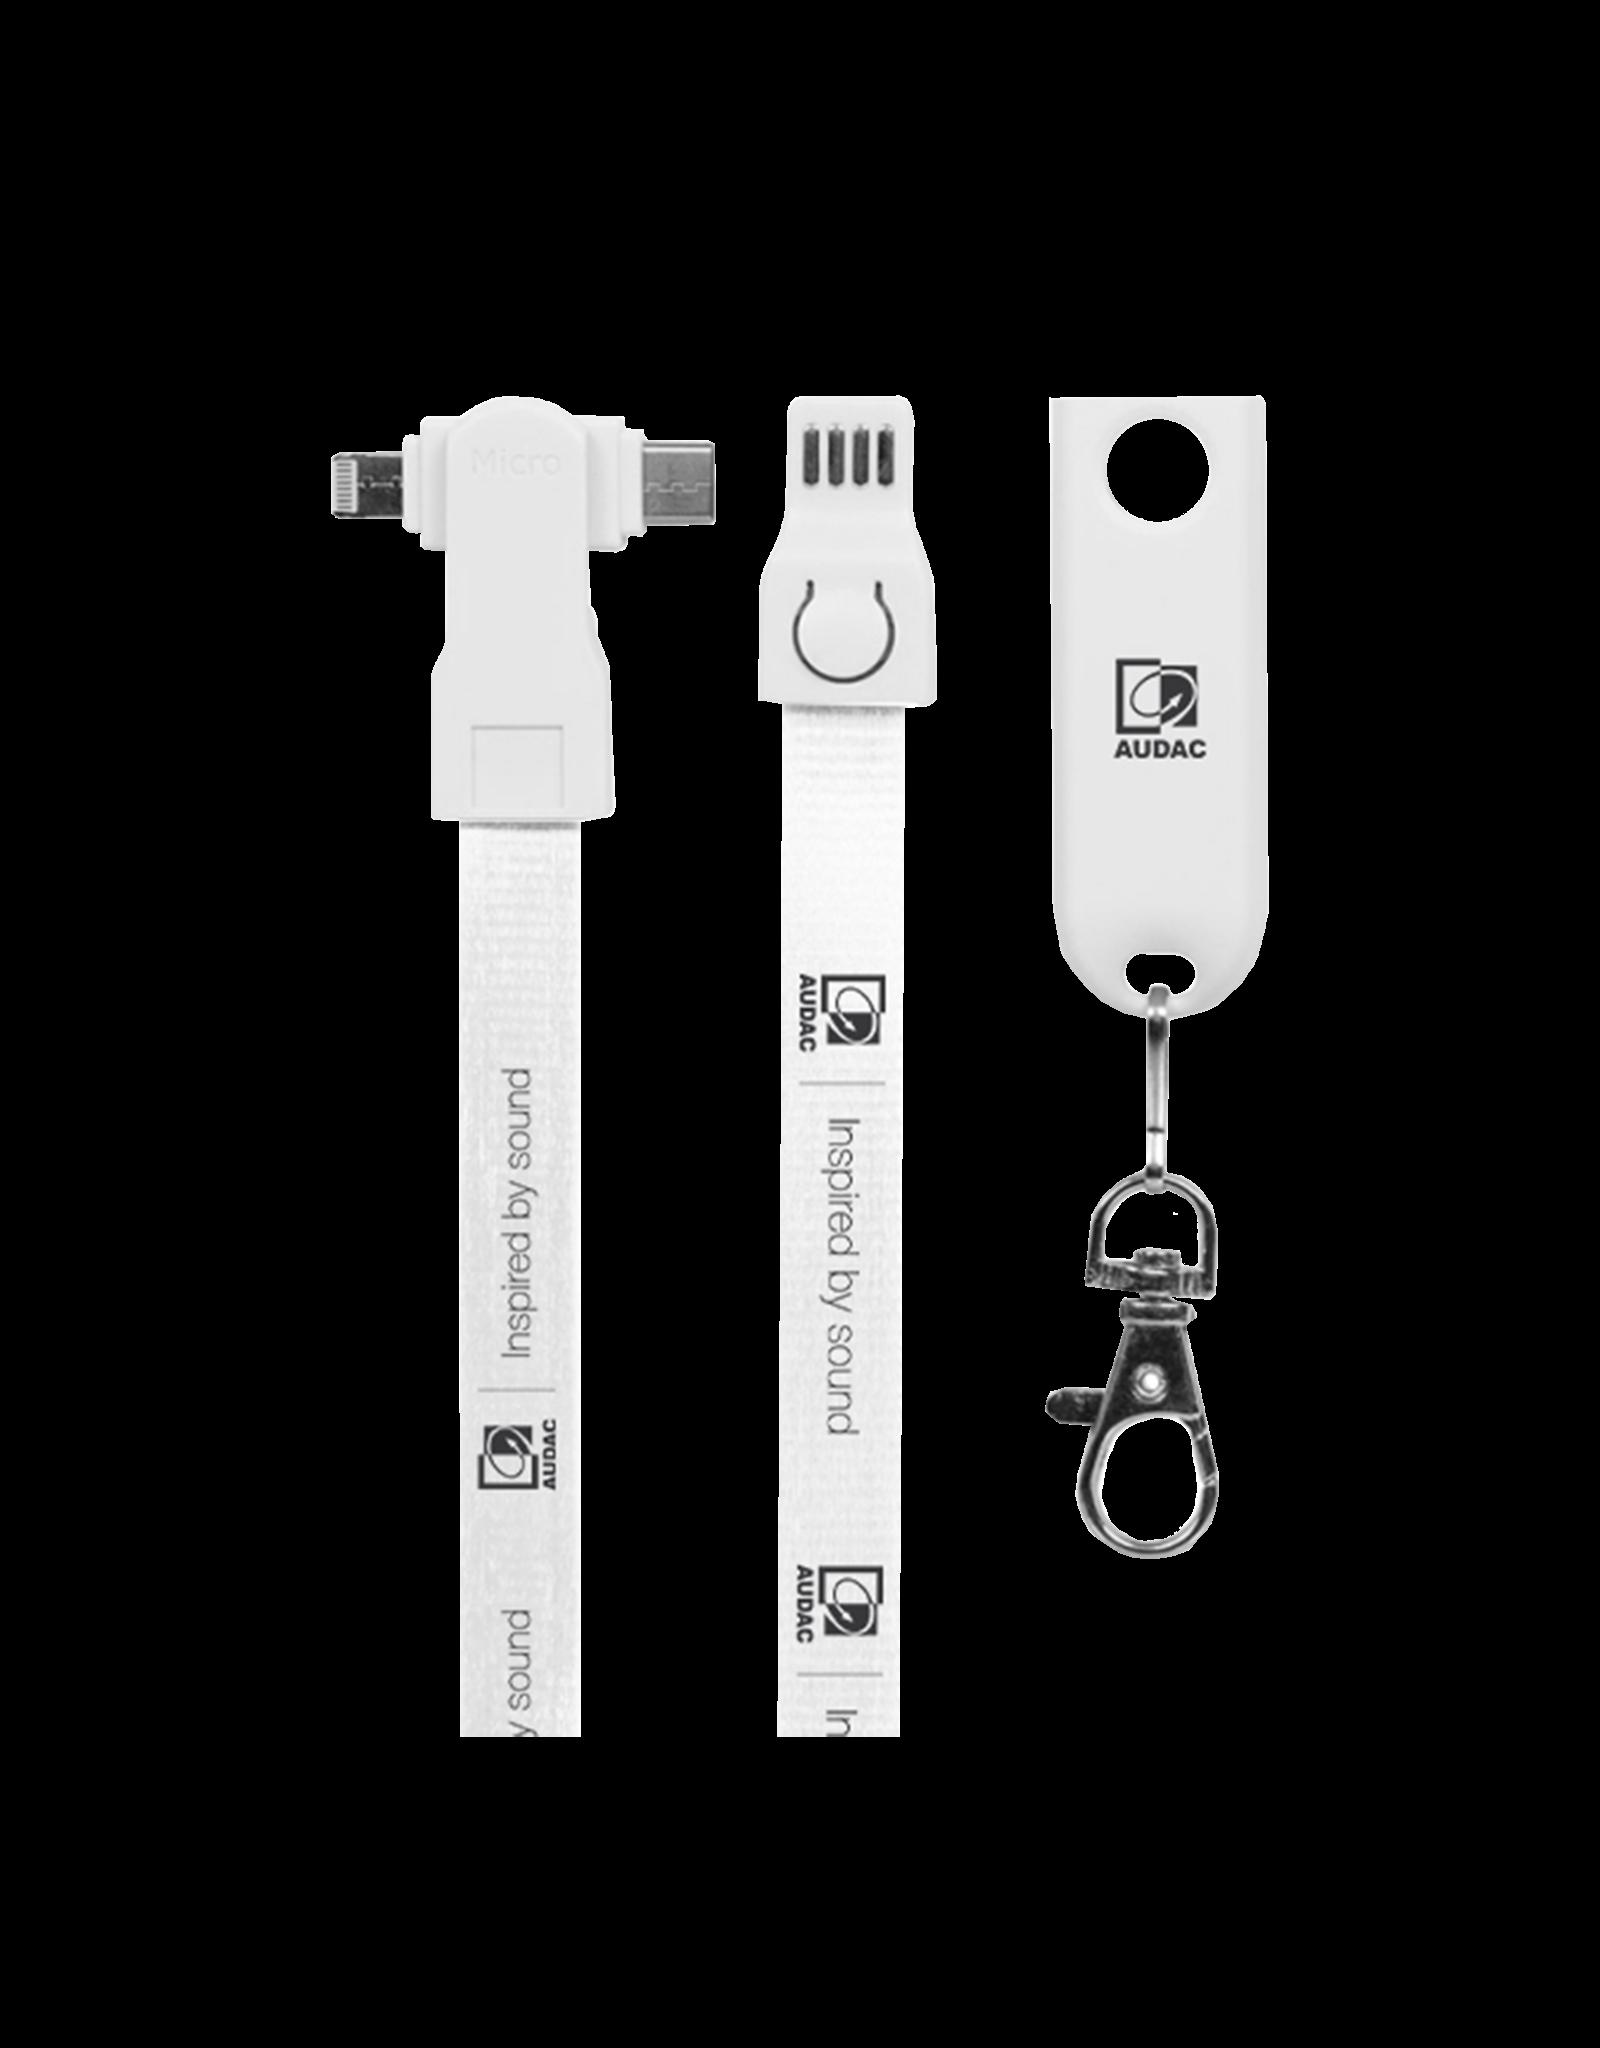 Audac AUDAC USB charging lanyard 3-in-1